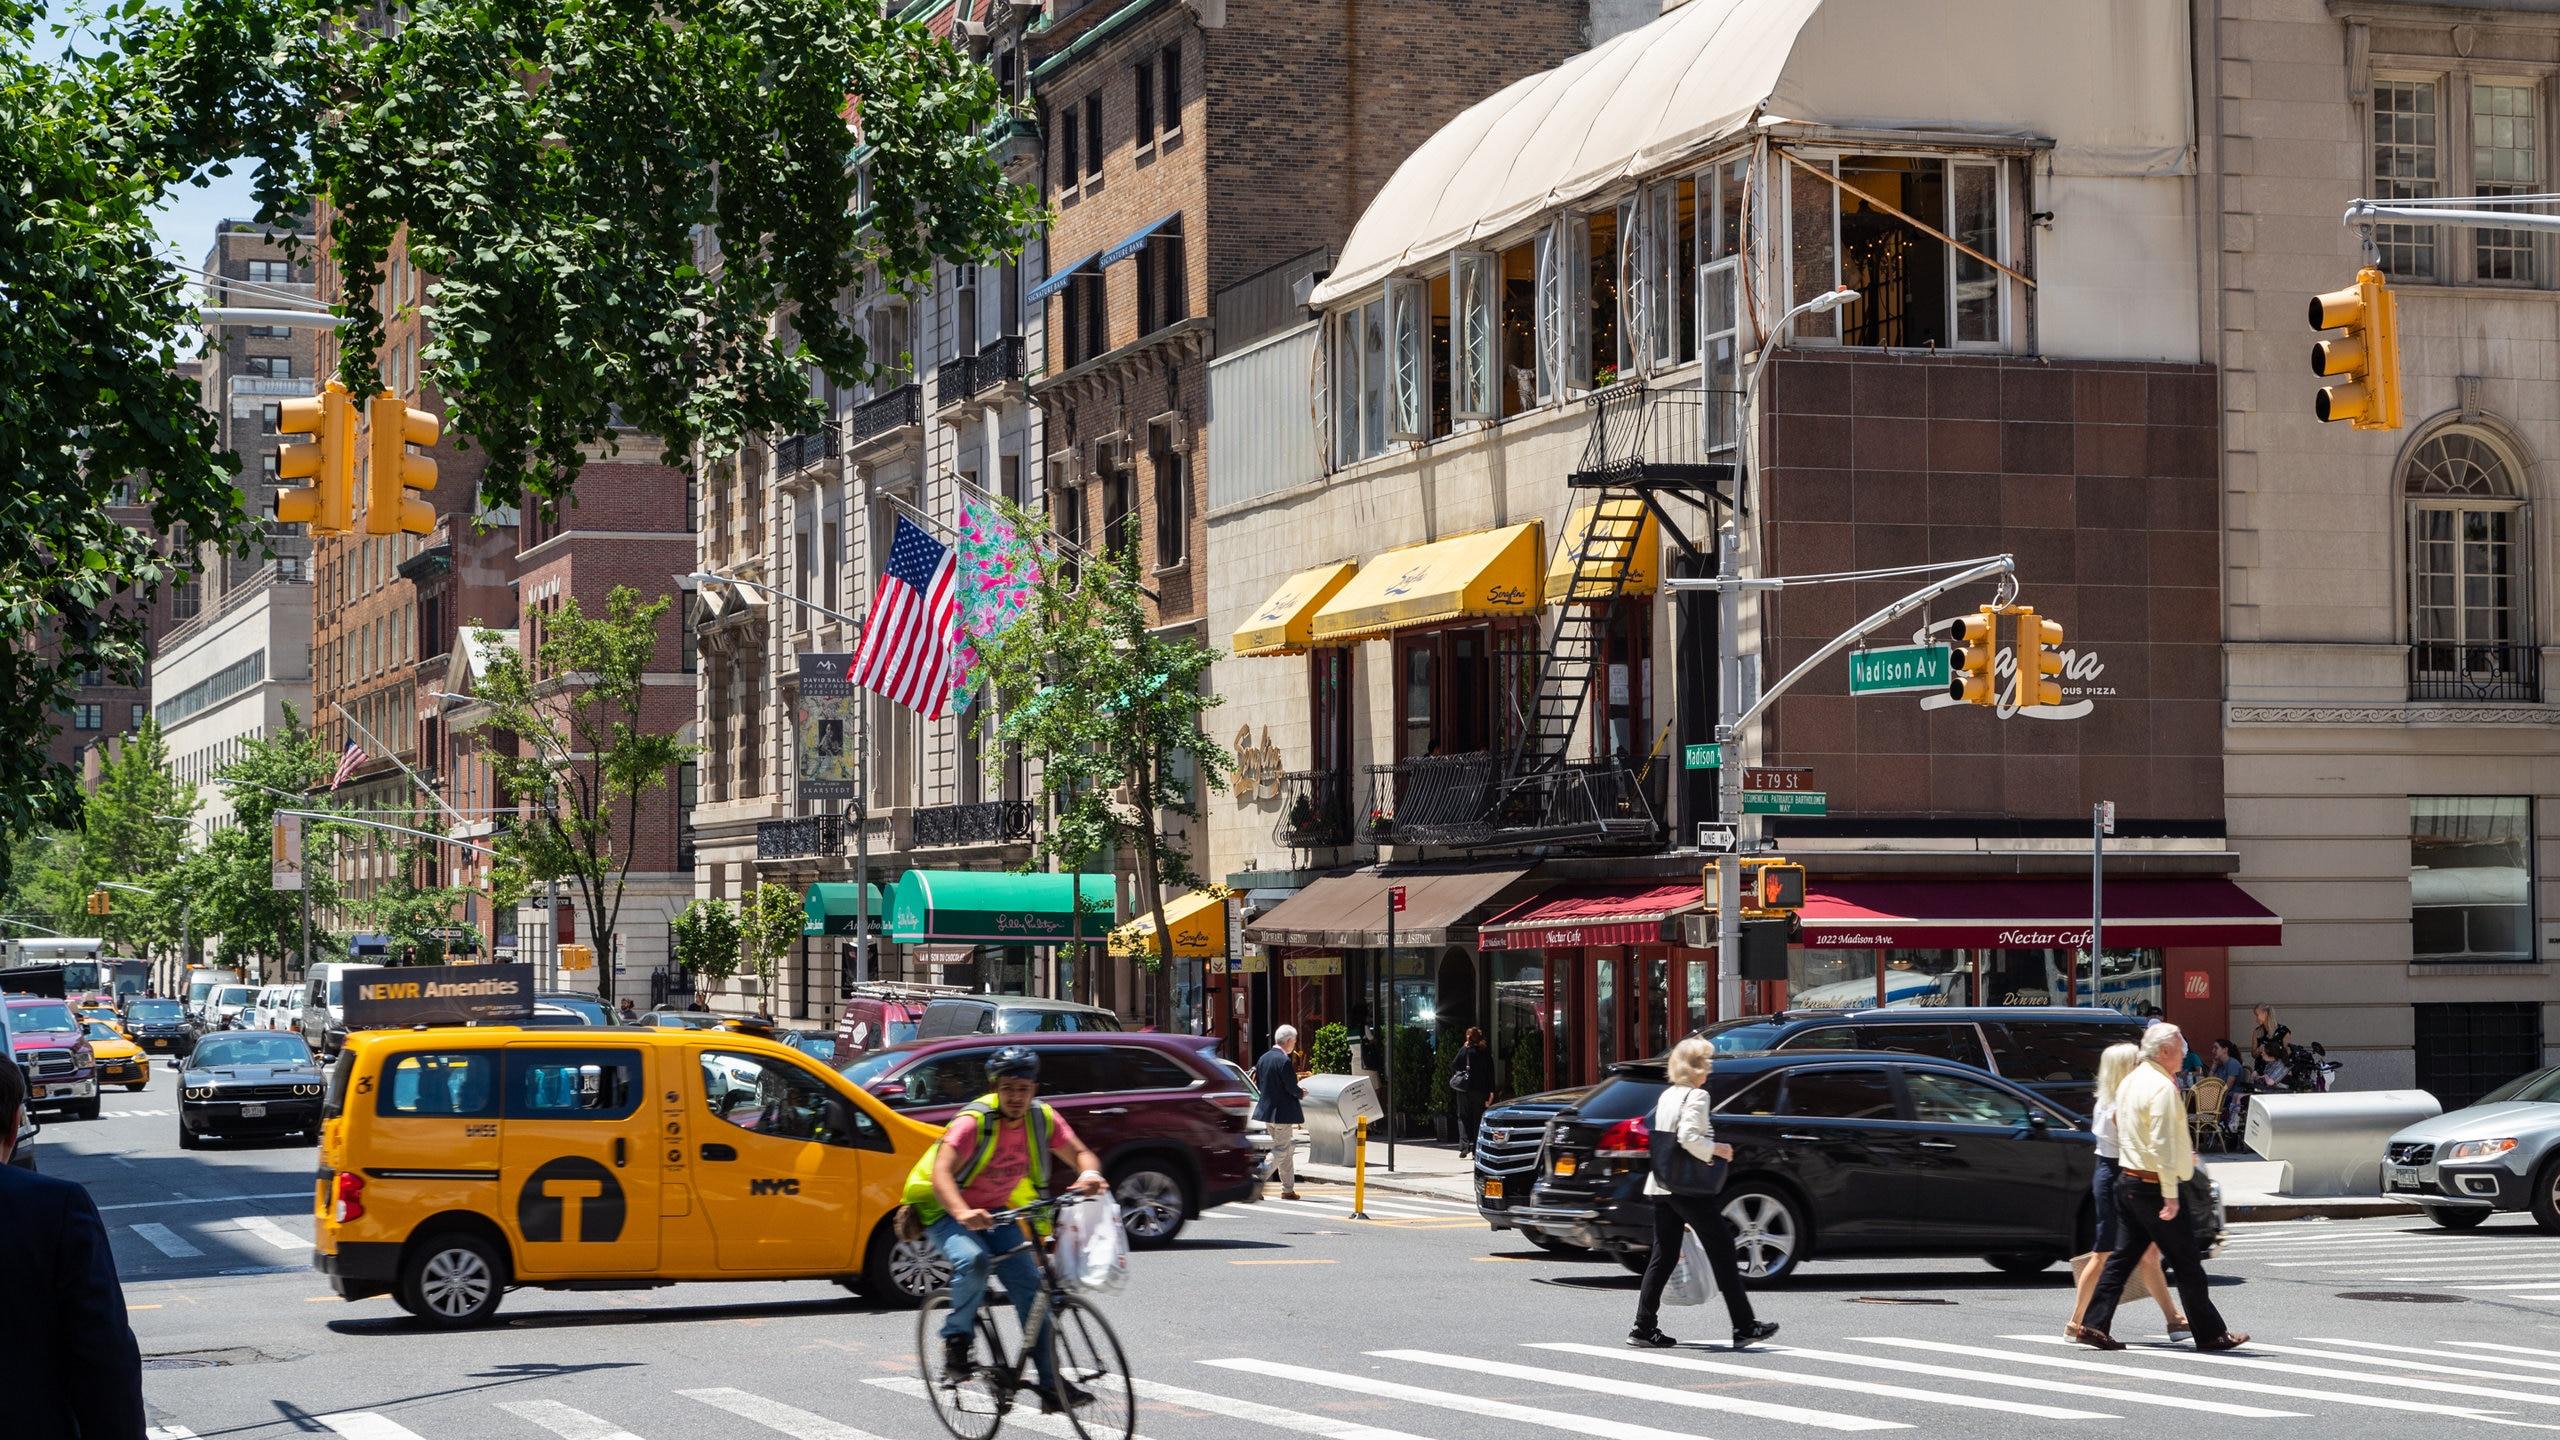 Upper East Side, New York, United States of America